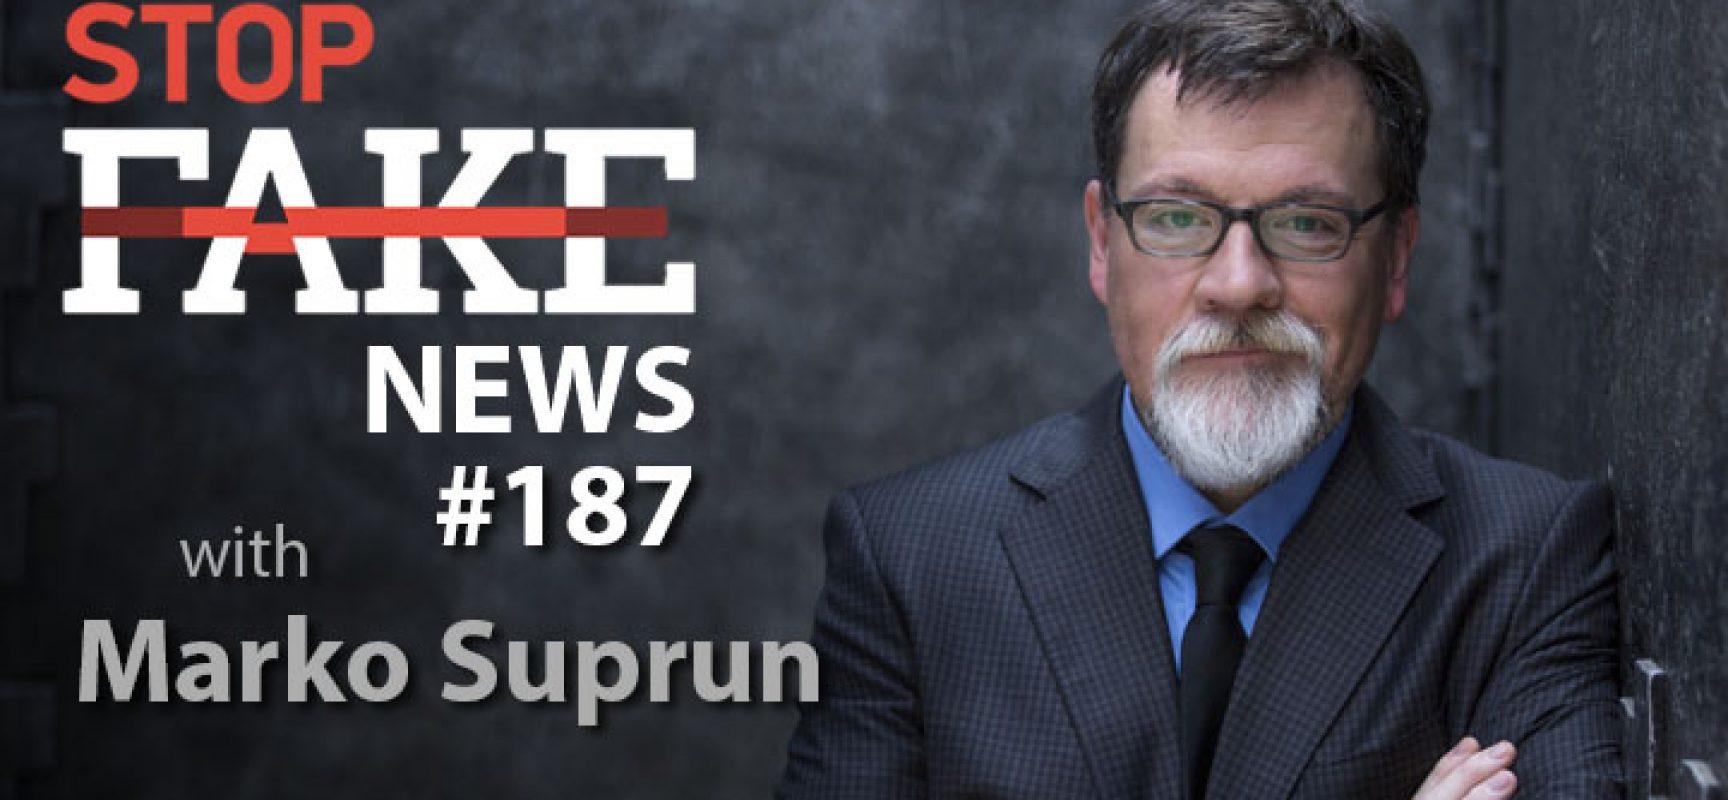 StopFake #187 con Marko Suprun